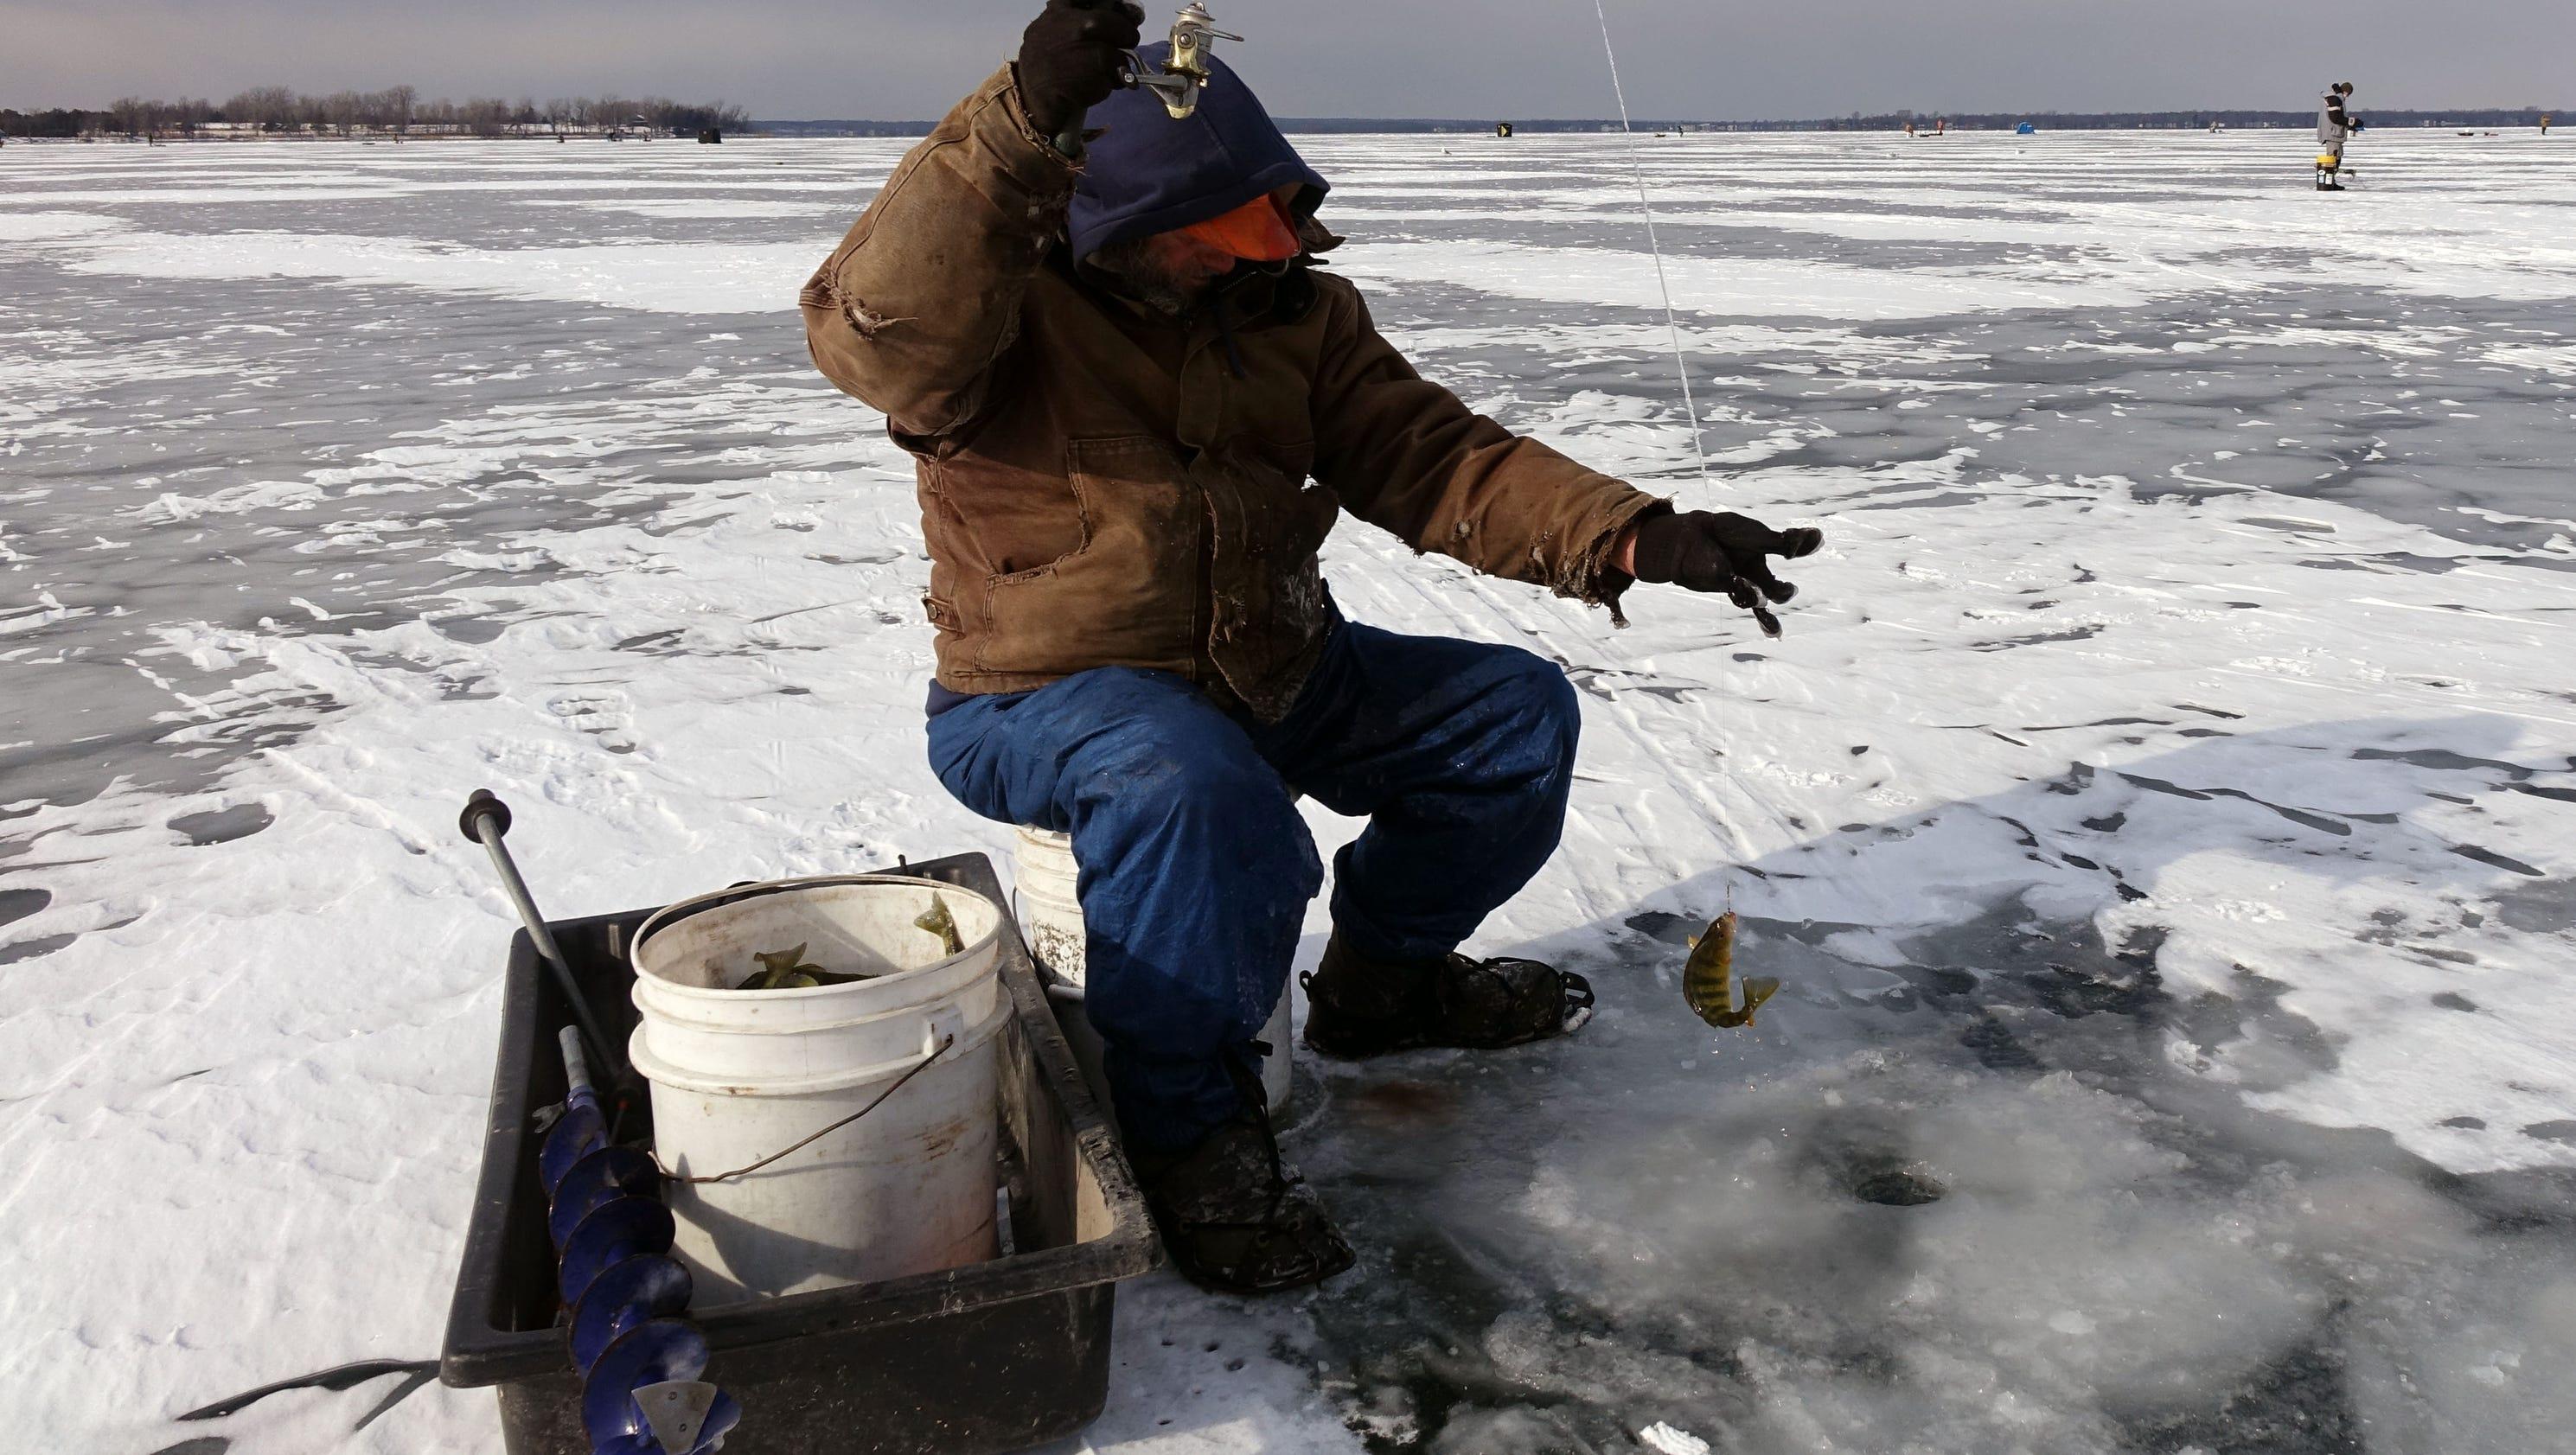 Warm Winter Limiting Ice Fishing On Lake Champlain